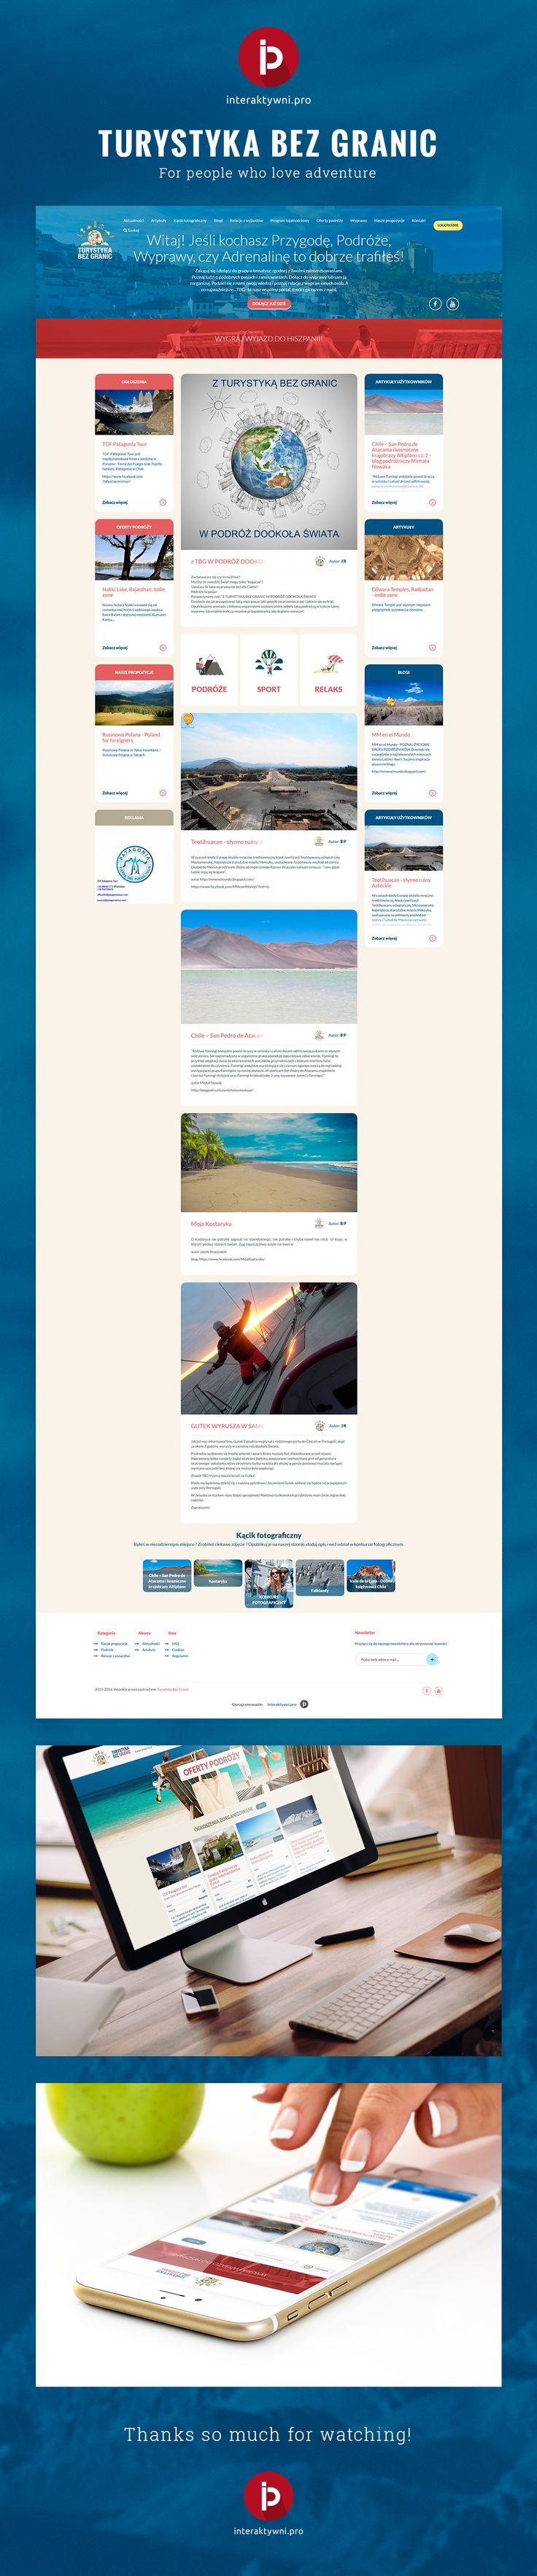 Tourist web portal Symfony PHP by interaktywni.pro www.turystykabezgranic.pl @interaktywnipro #uxdesign #website #portal #interaktywni #webdevelopment